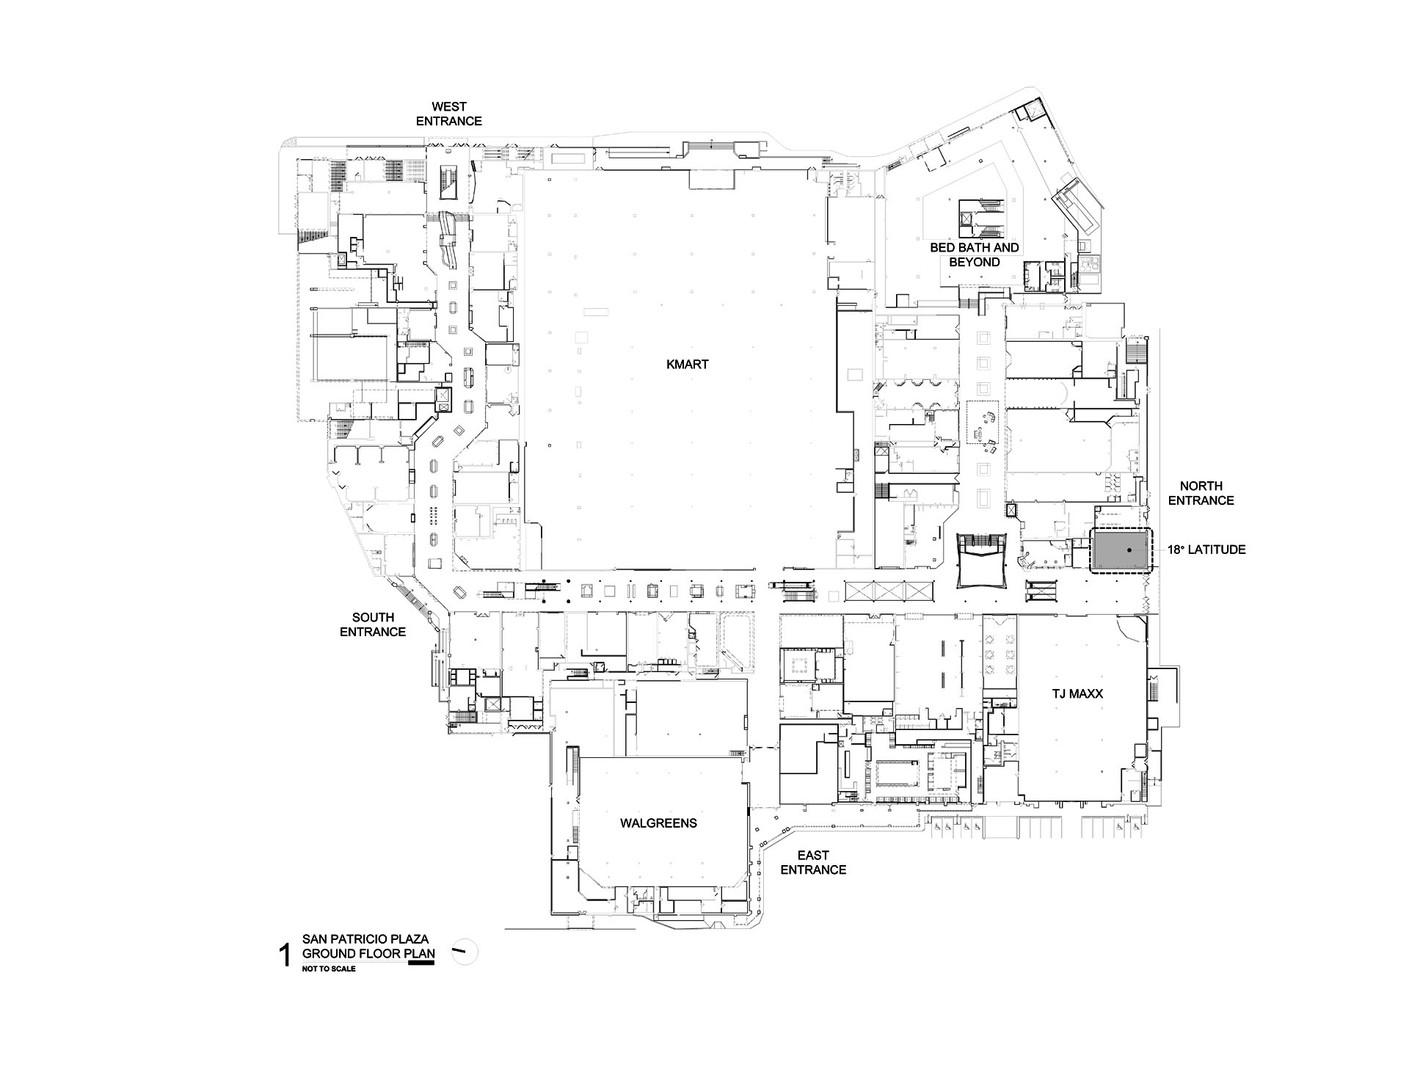 San Patricio Plaza Ground Floor Plan